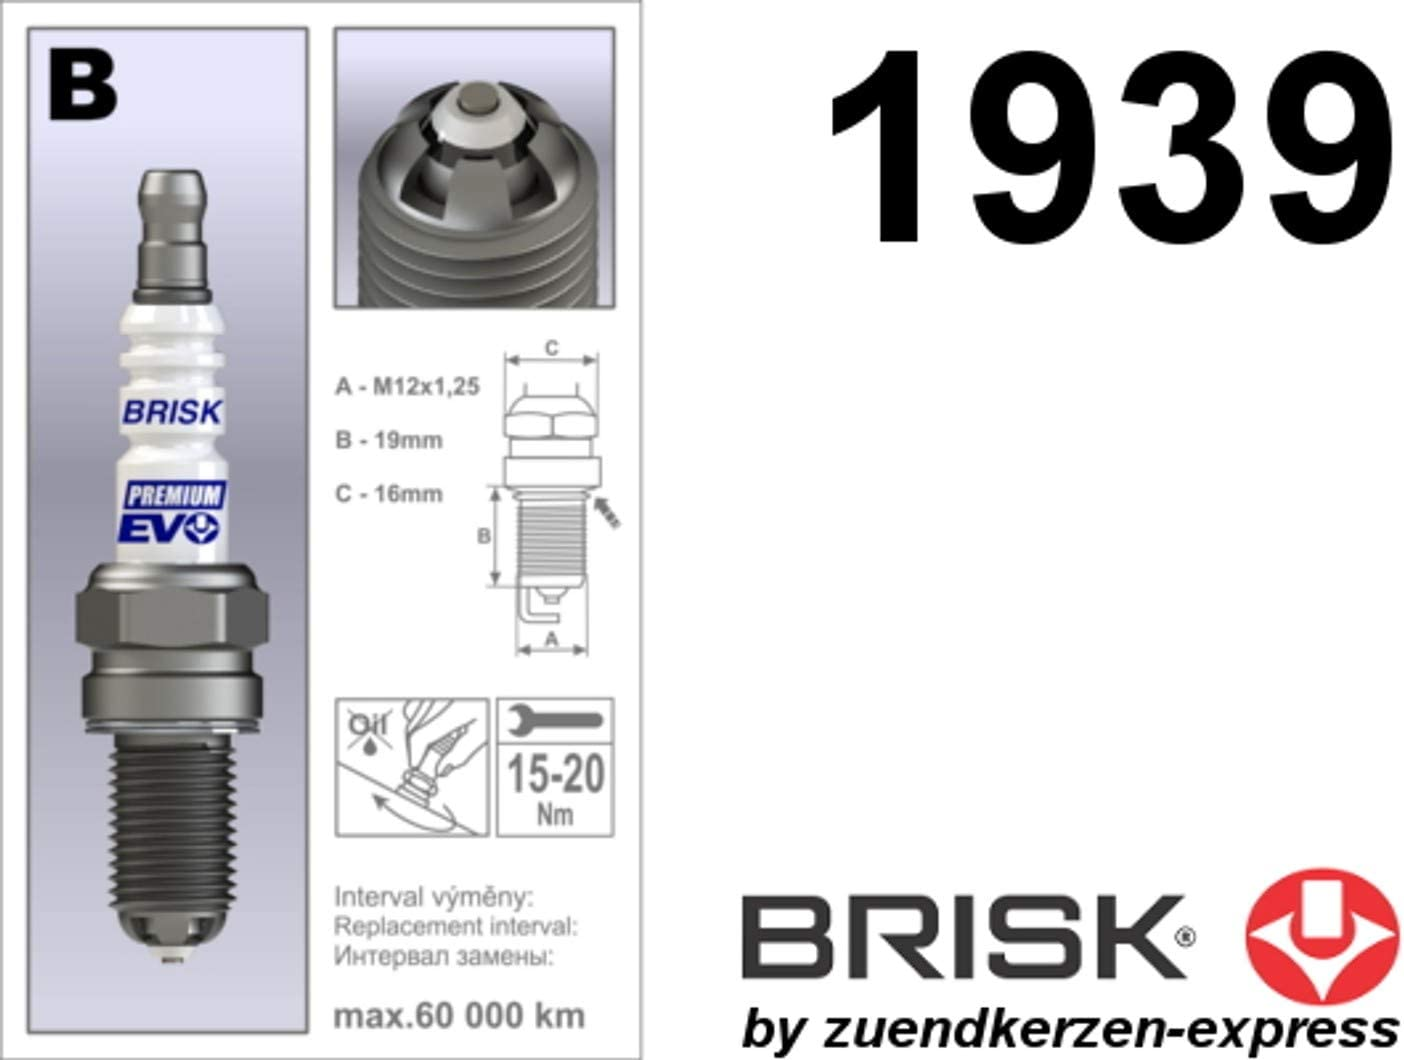 Buj/ías 4 unidades Brisk Premium EVO BR14BFXC 1939